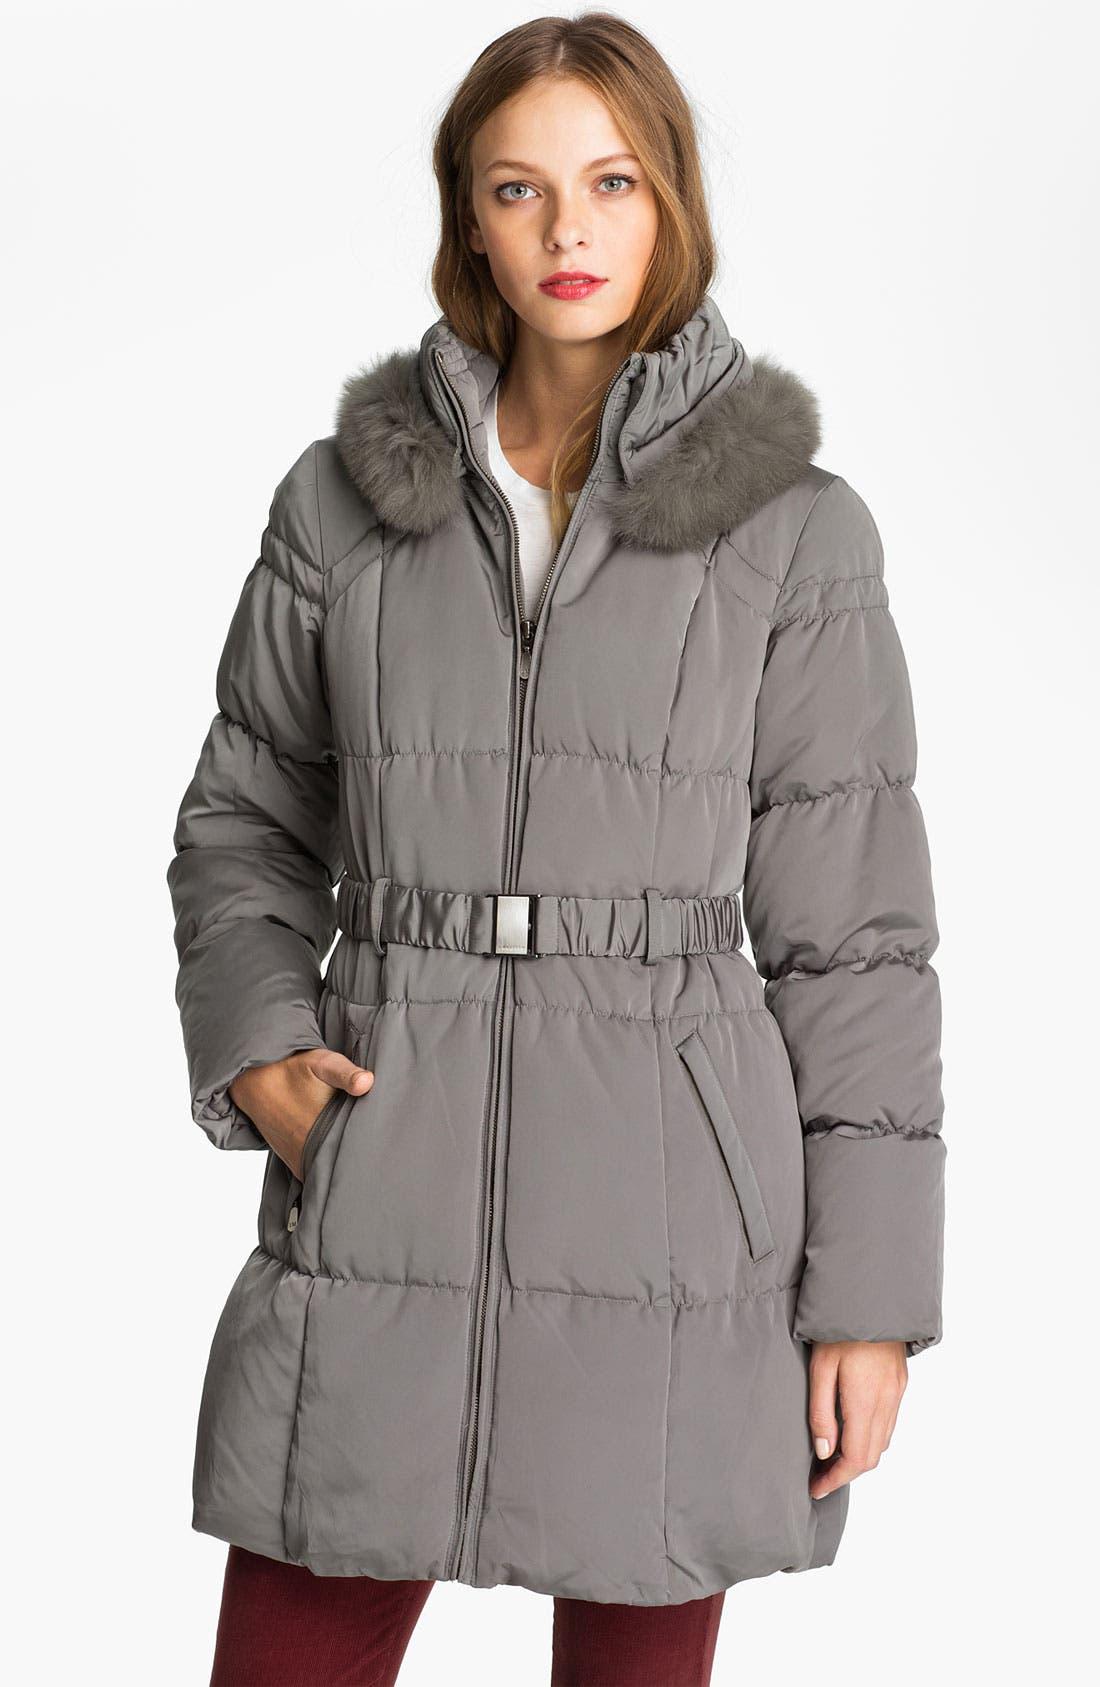 Alternate Image 1 Selected - 1 Madison Genuine Fox Fur Trim Quilted Coat (Online Exclusive)